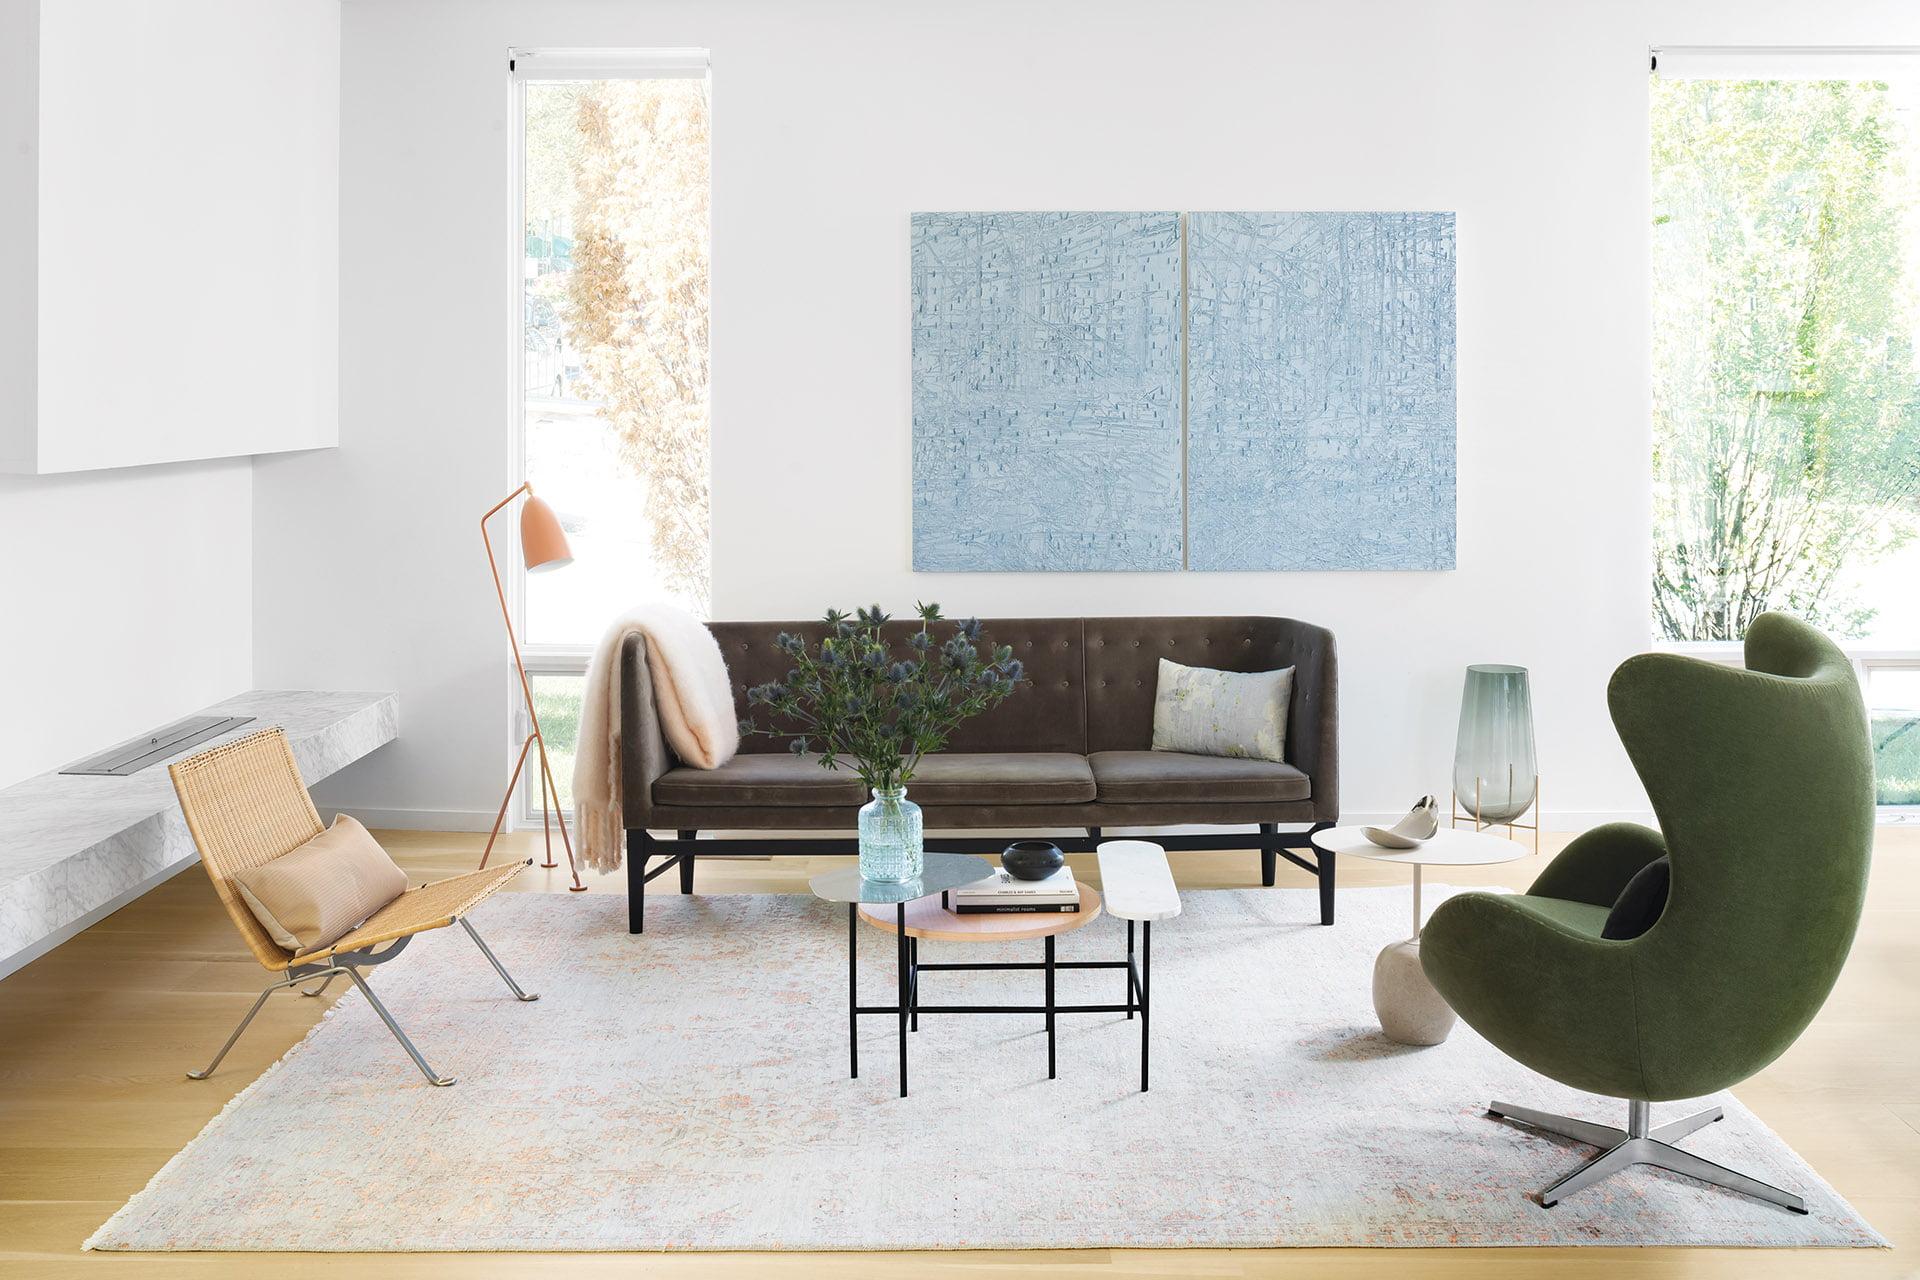 Arne Jacobsen蛋椅和市长沙发到庞克kjaerholm型号pk22柳条椅。